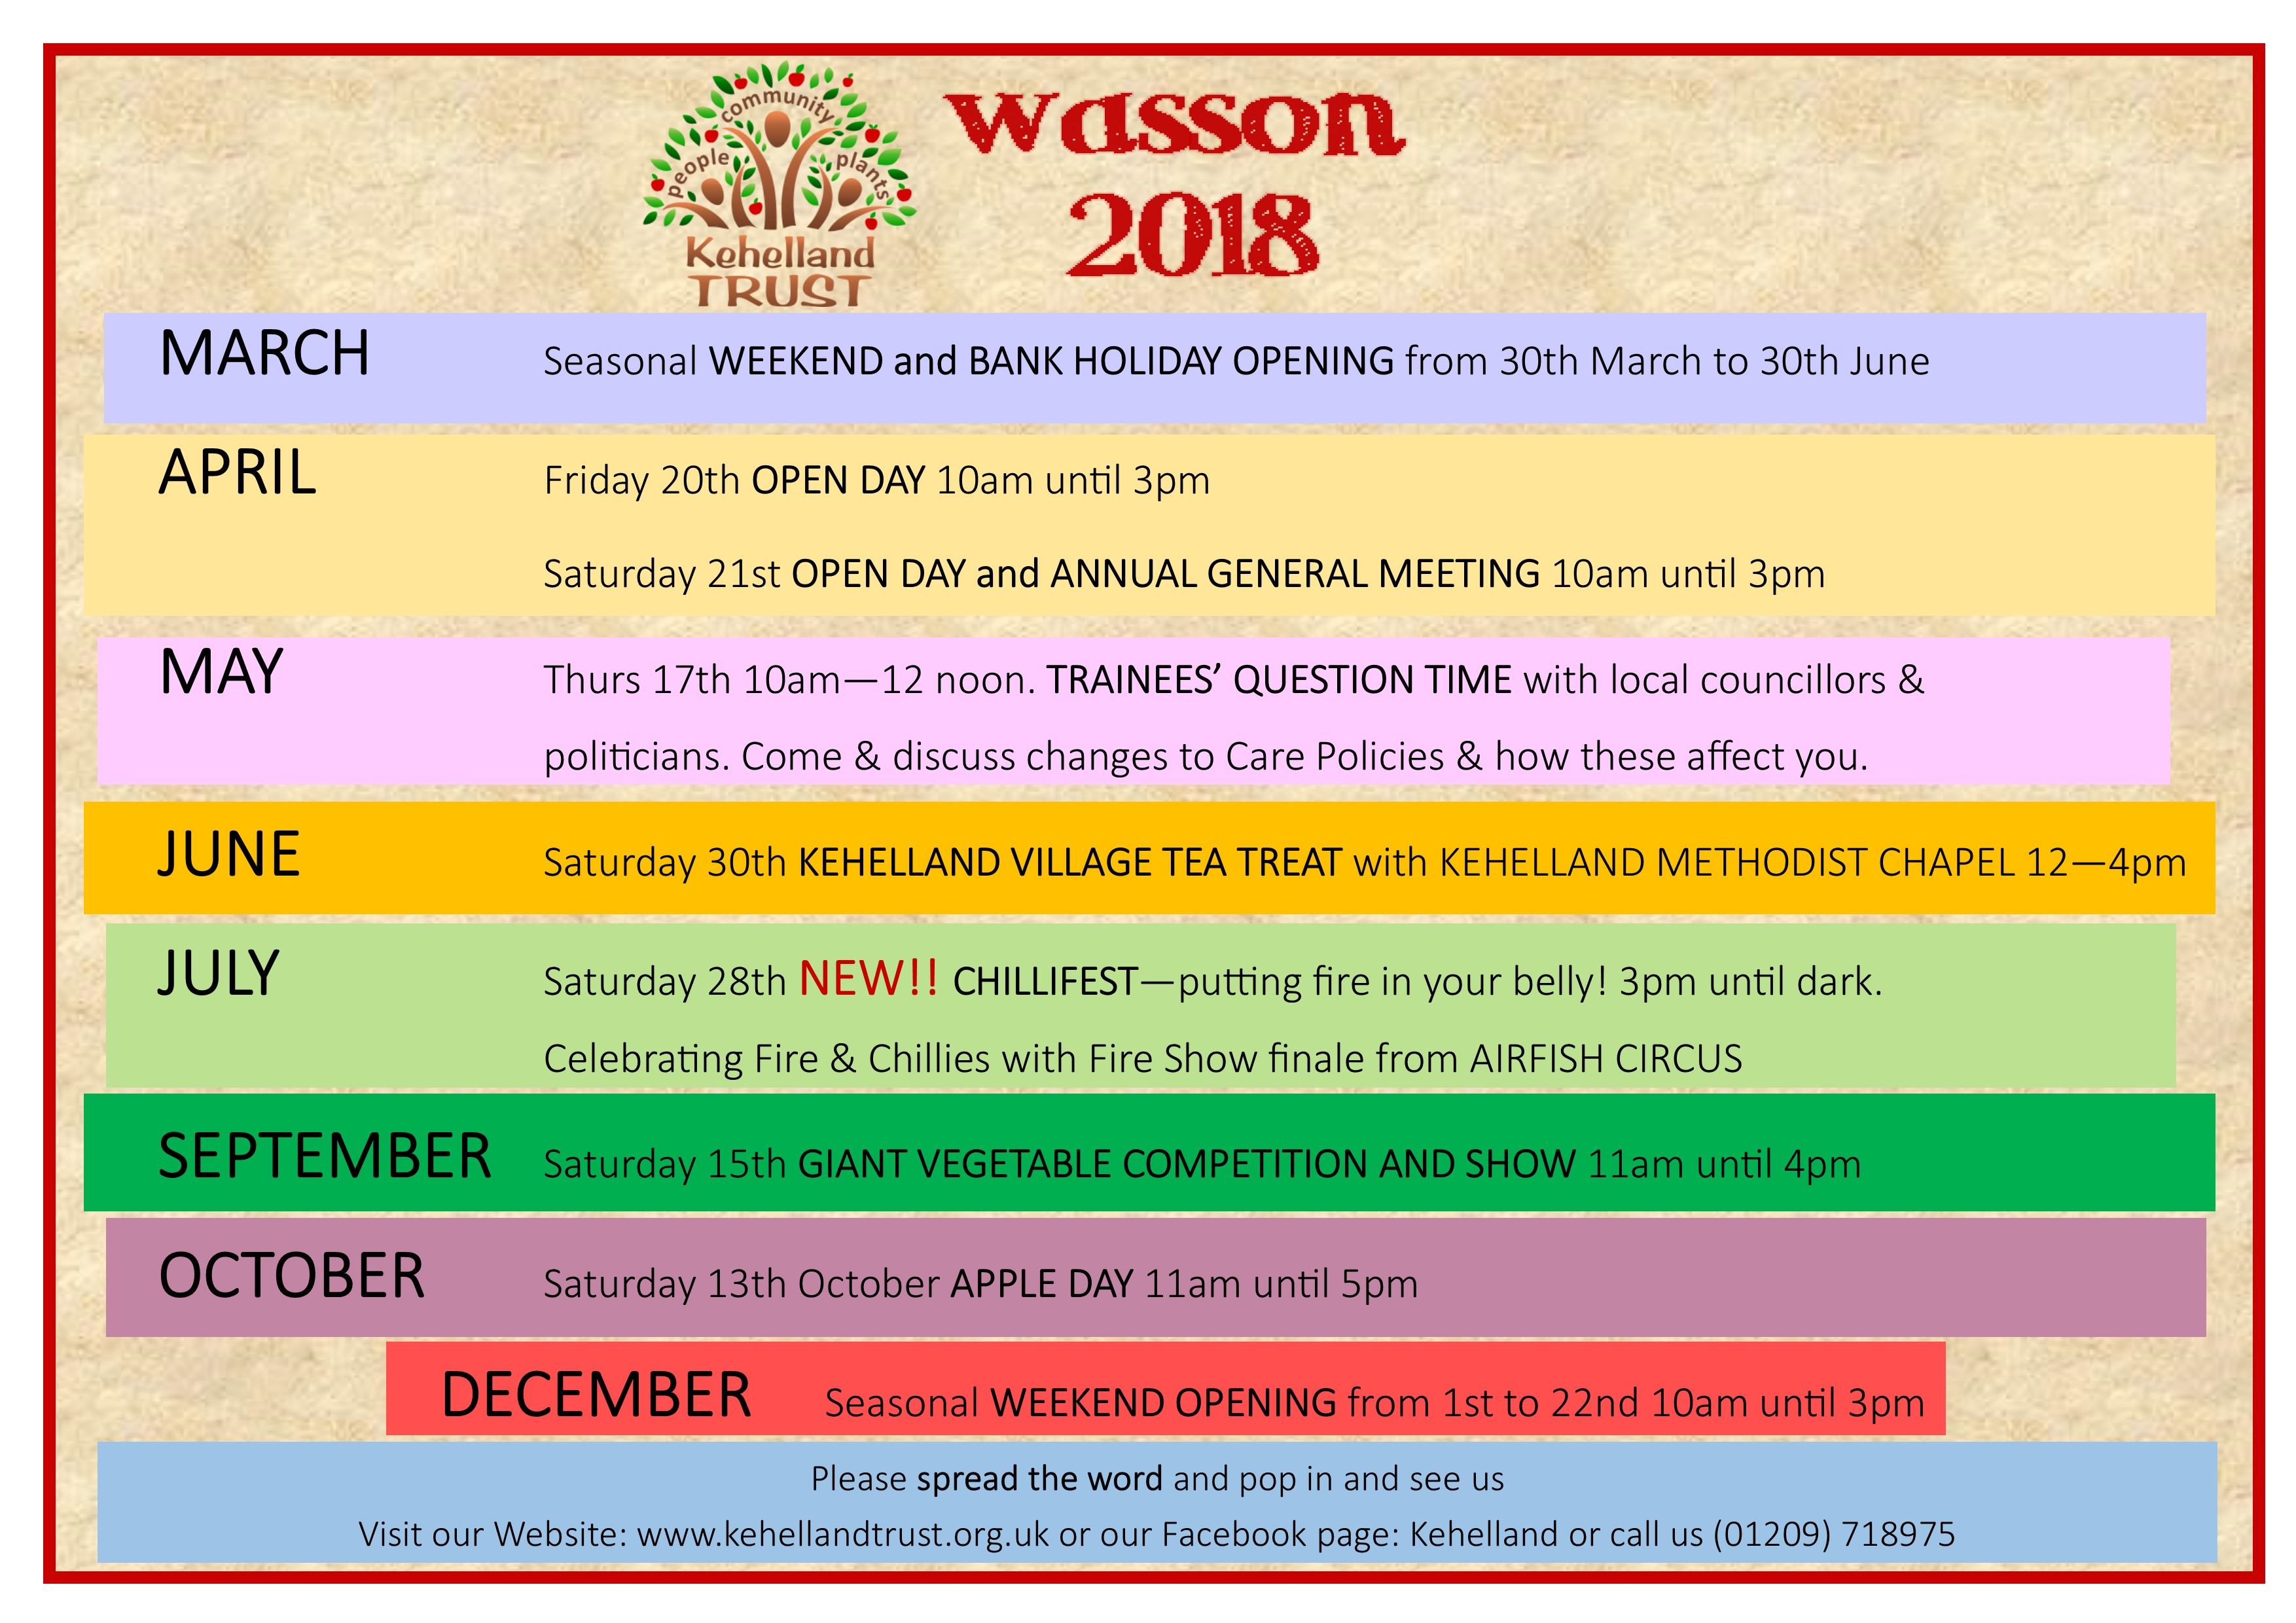 Wasson 2018